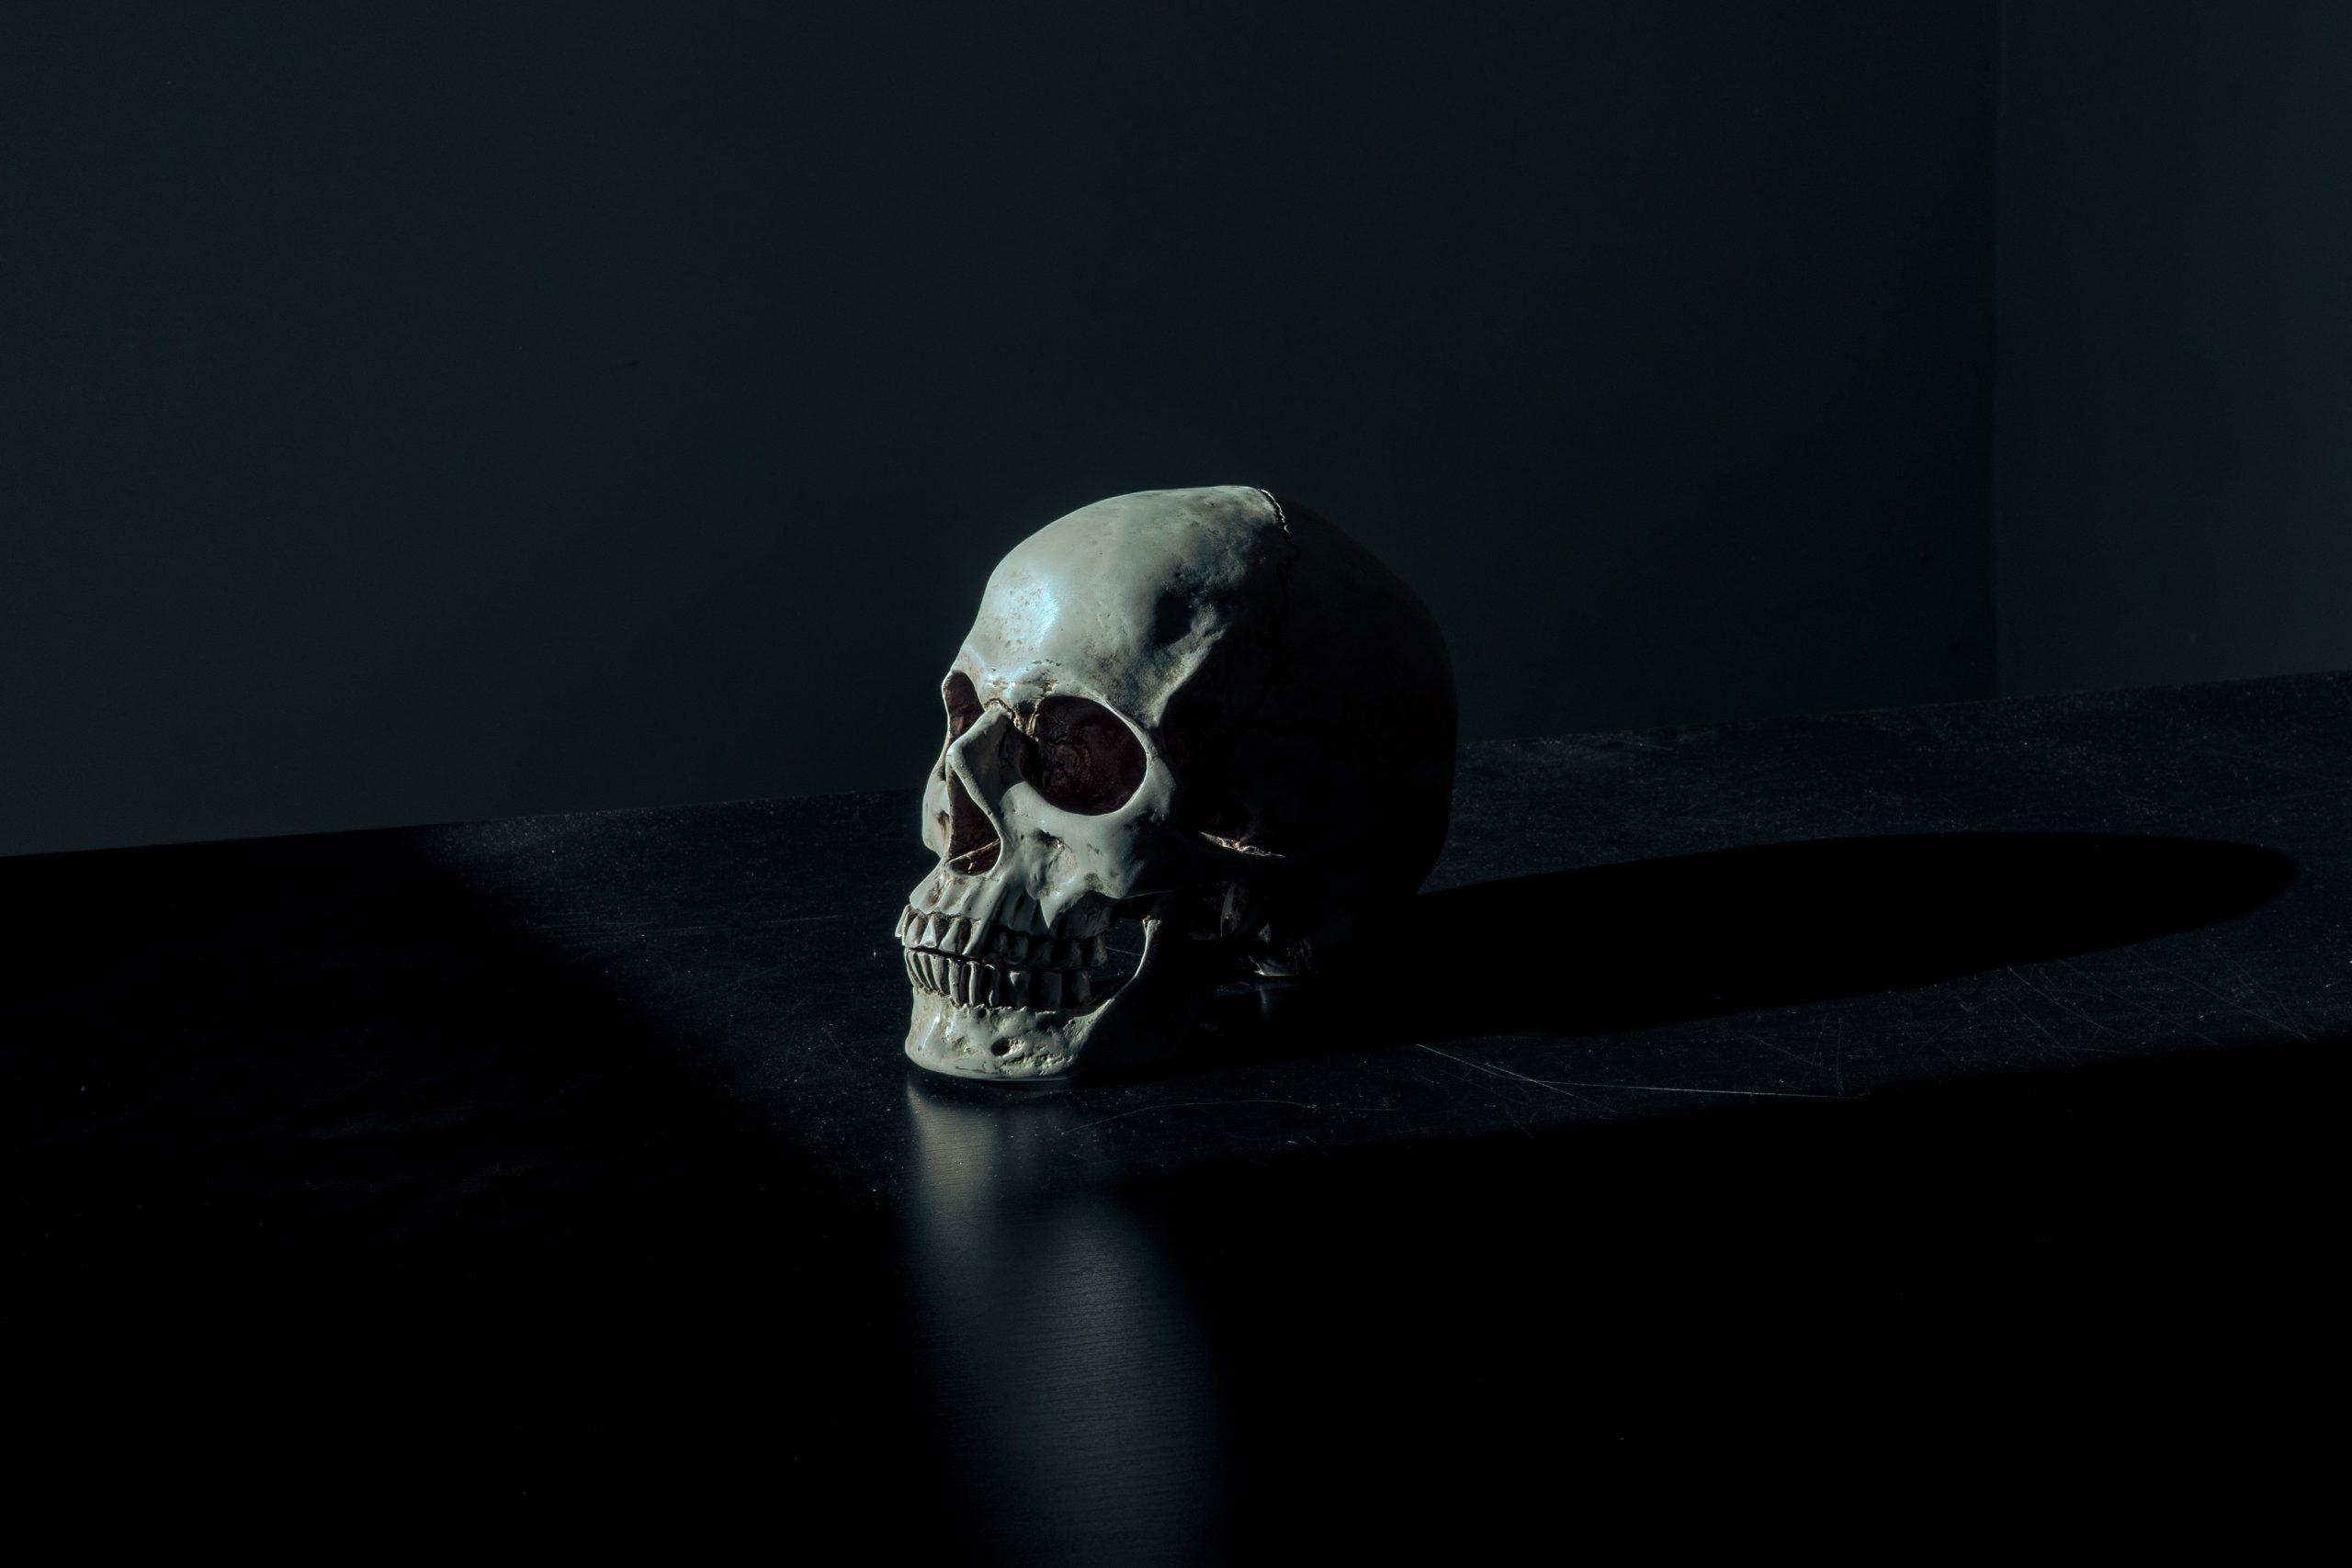 wallpaper White and black skull figurine on black surface